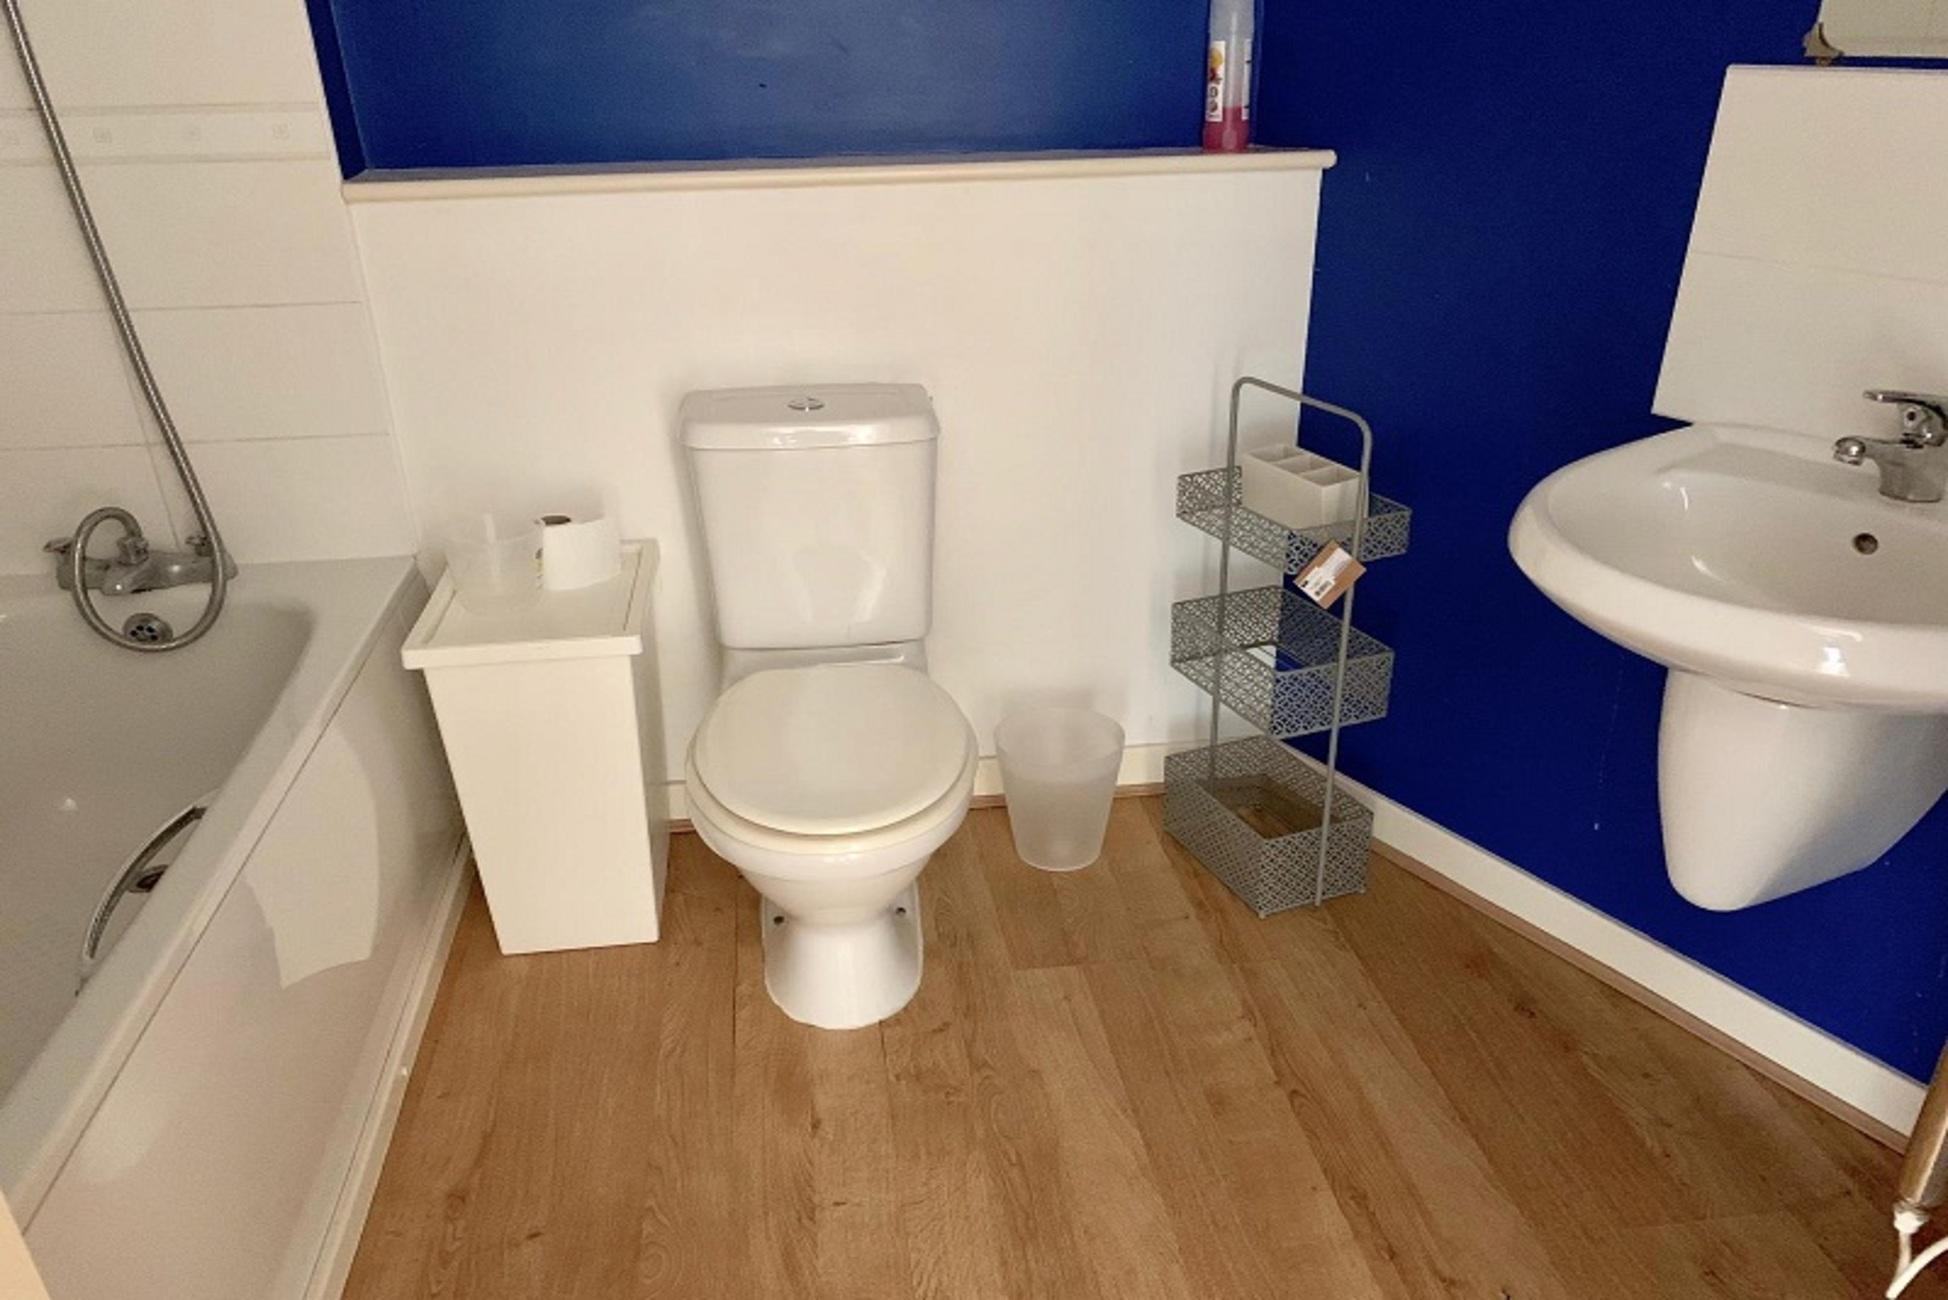 toilet_1948x1300